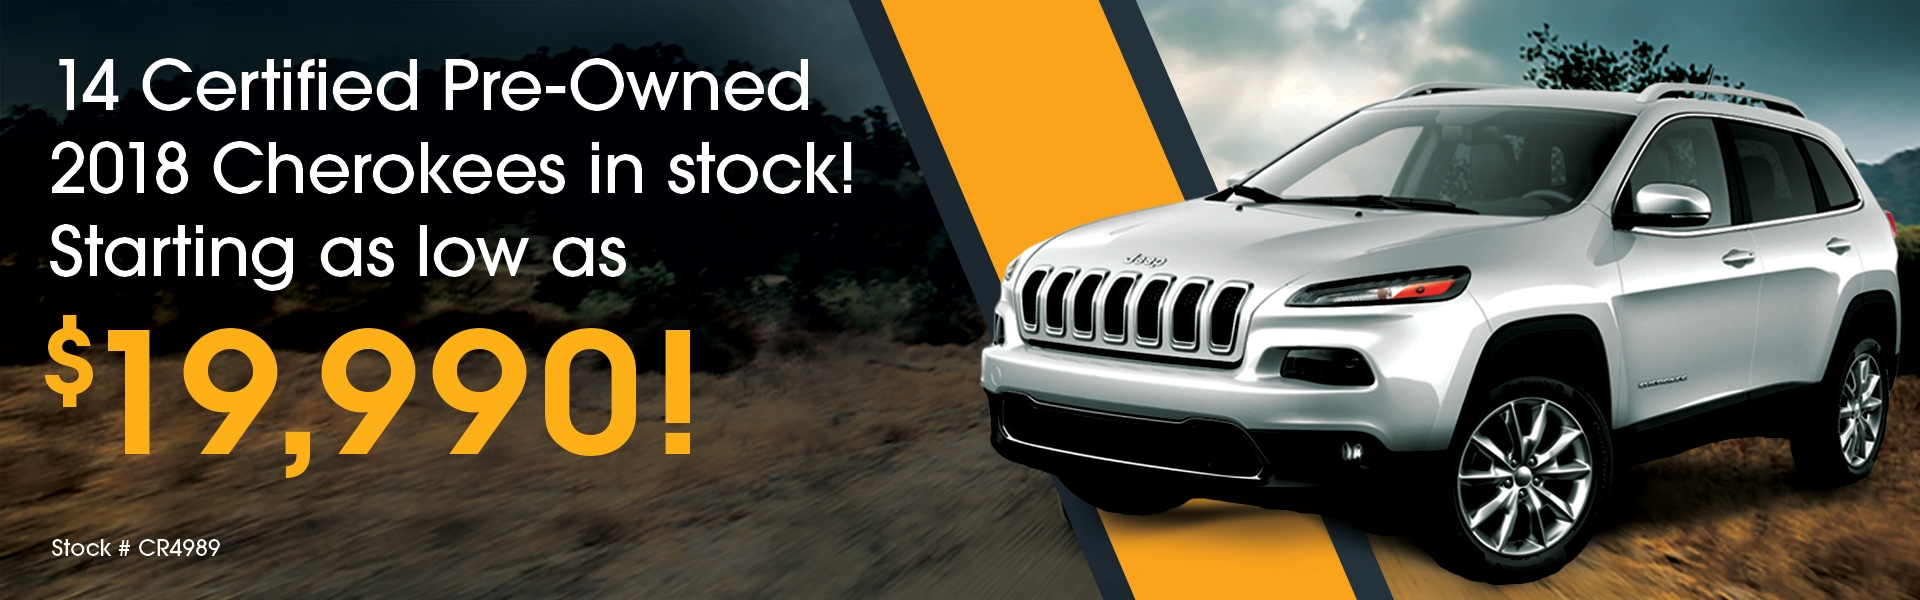 Gresham Chrysler Dodge Jeep Ram | New & Used Dealership in